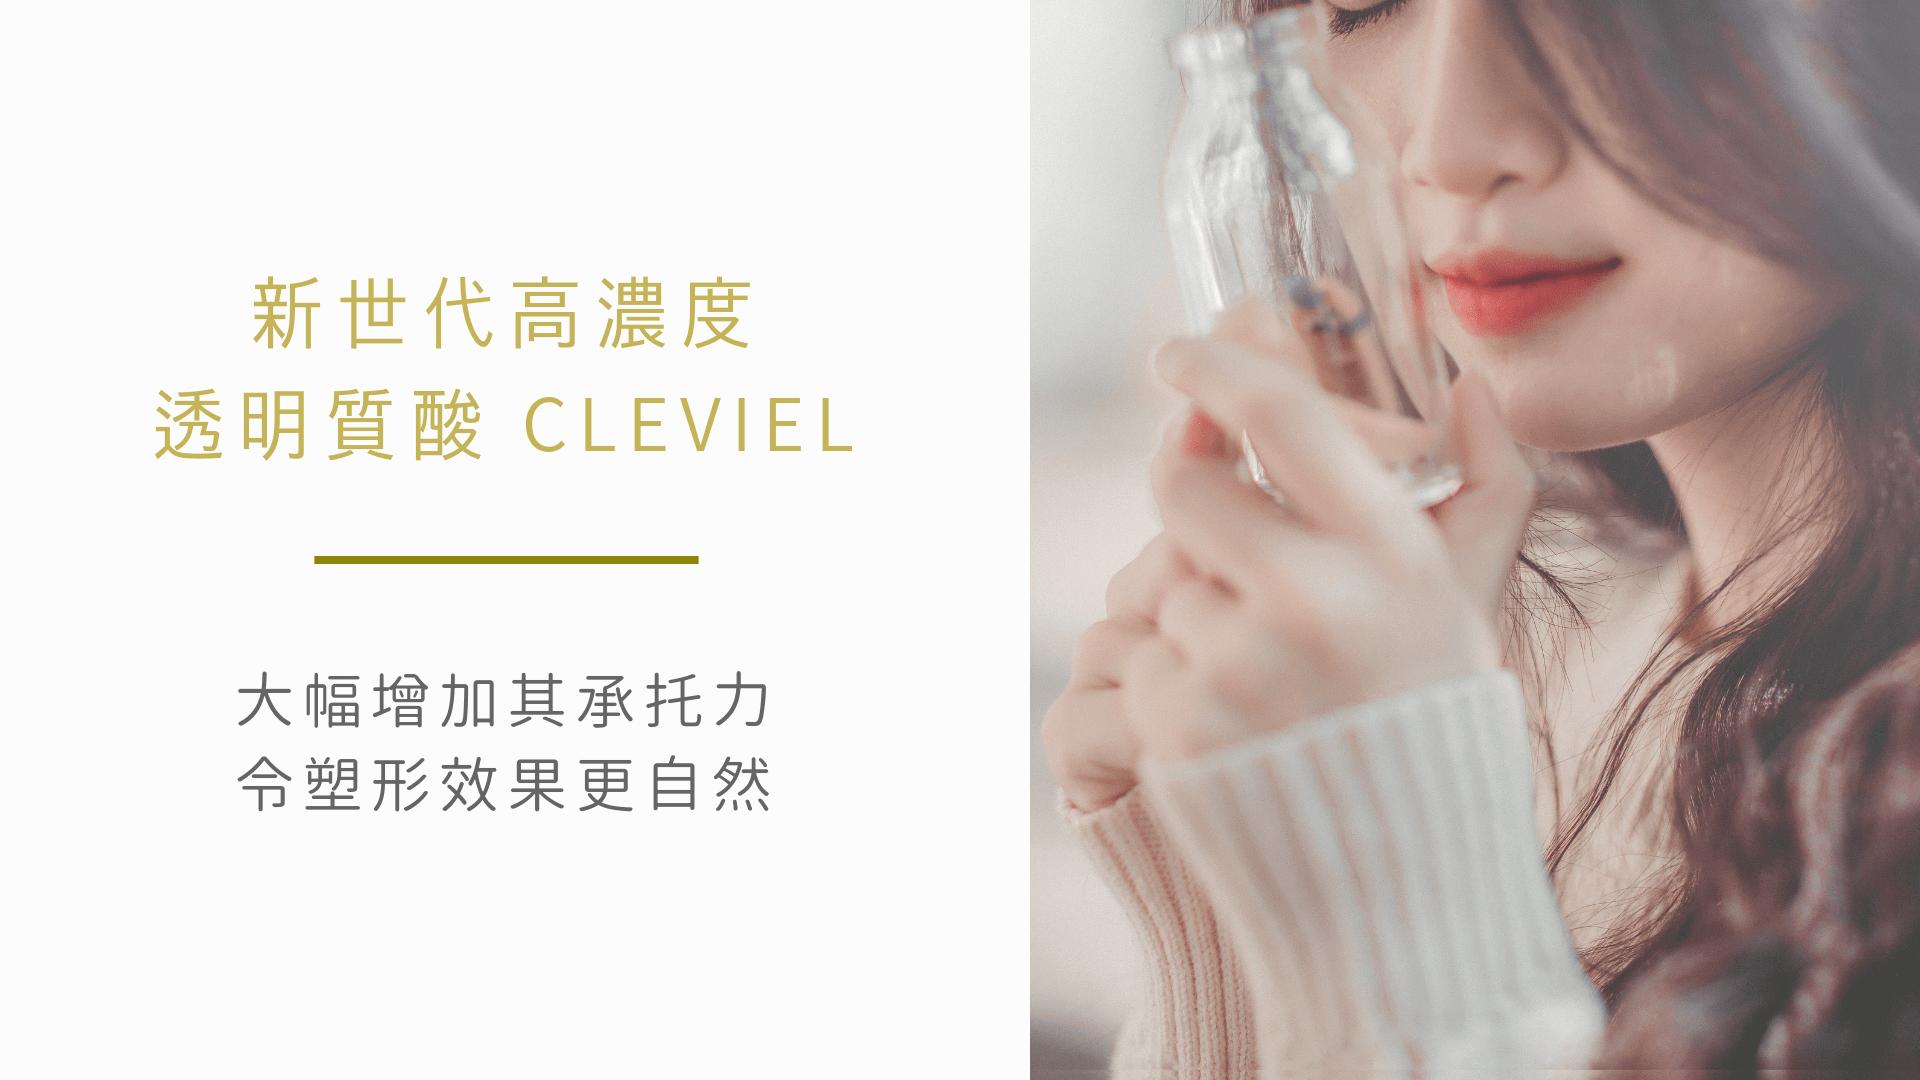 Cleviel 新世代高濃度透明質酸